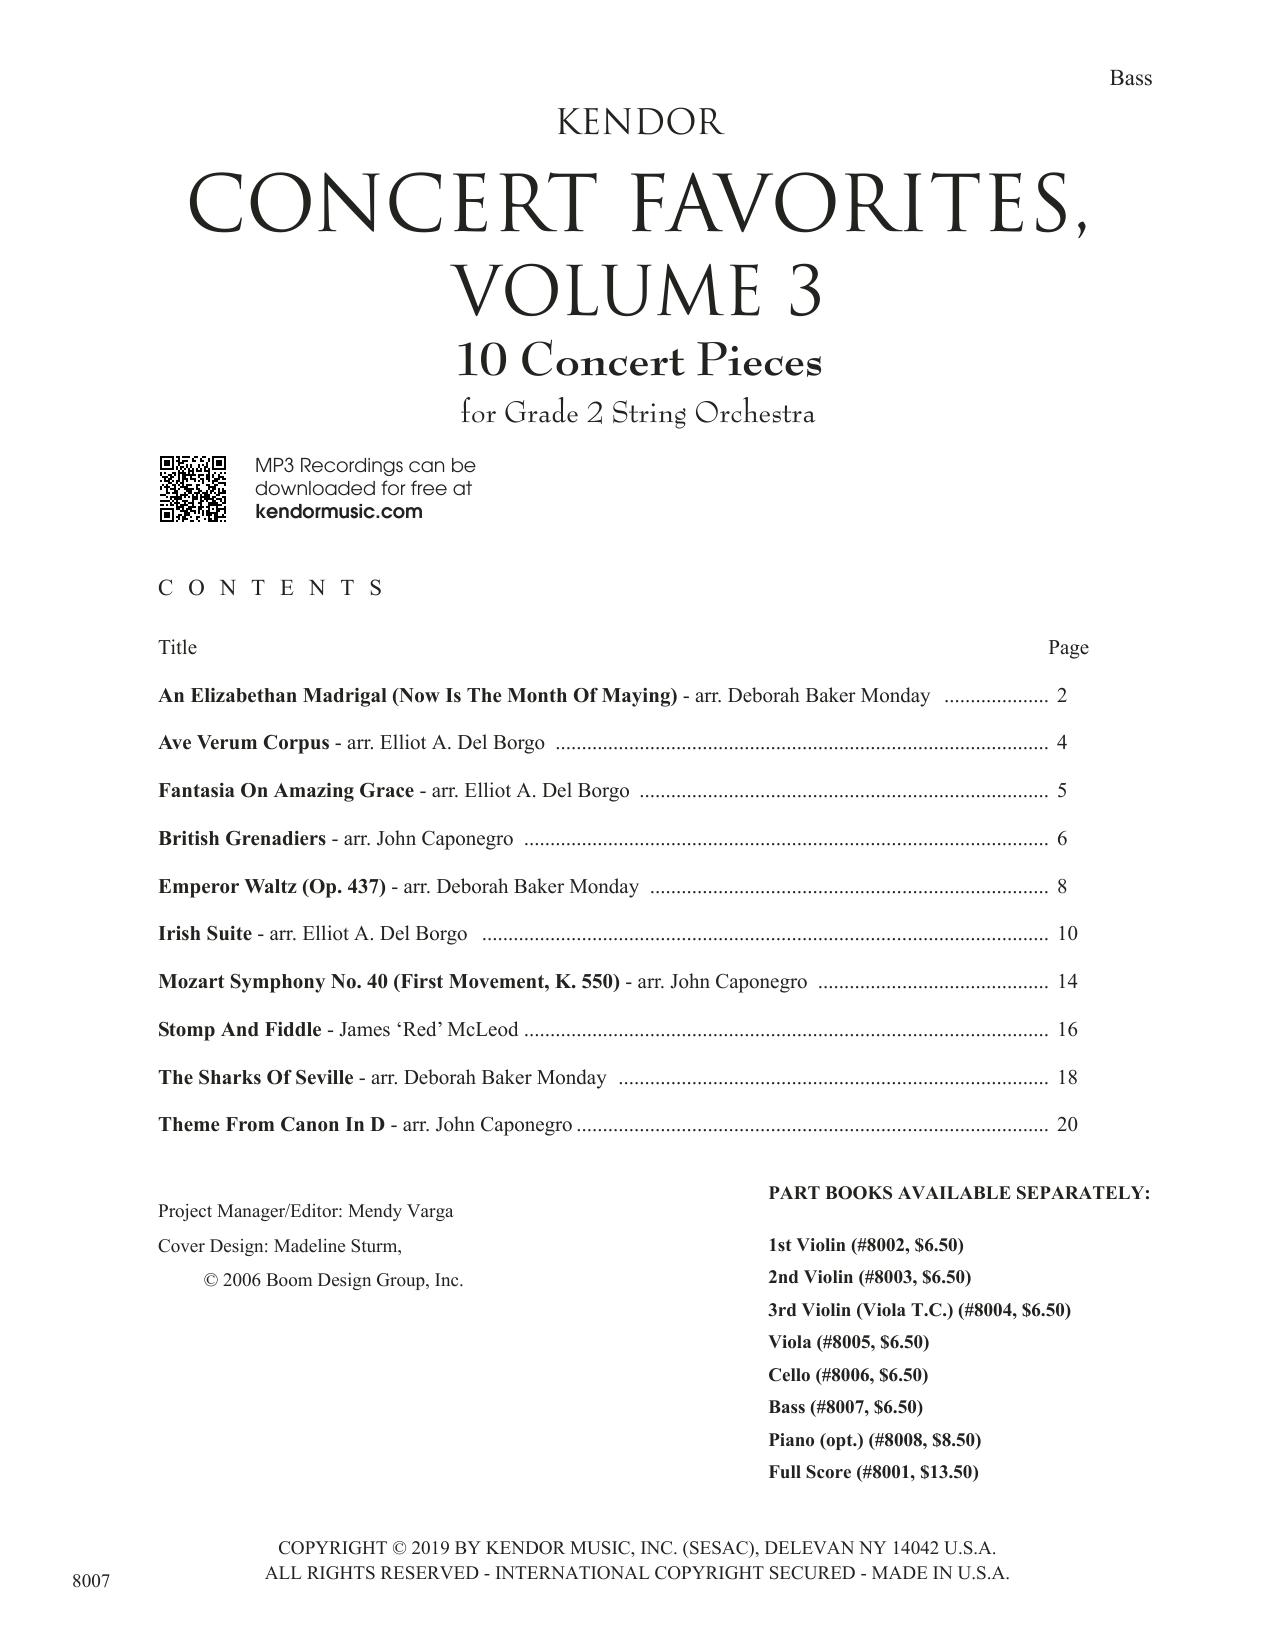 Kendor Concert Favorites, Volume 3 - Bass Sheet Music